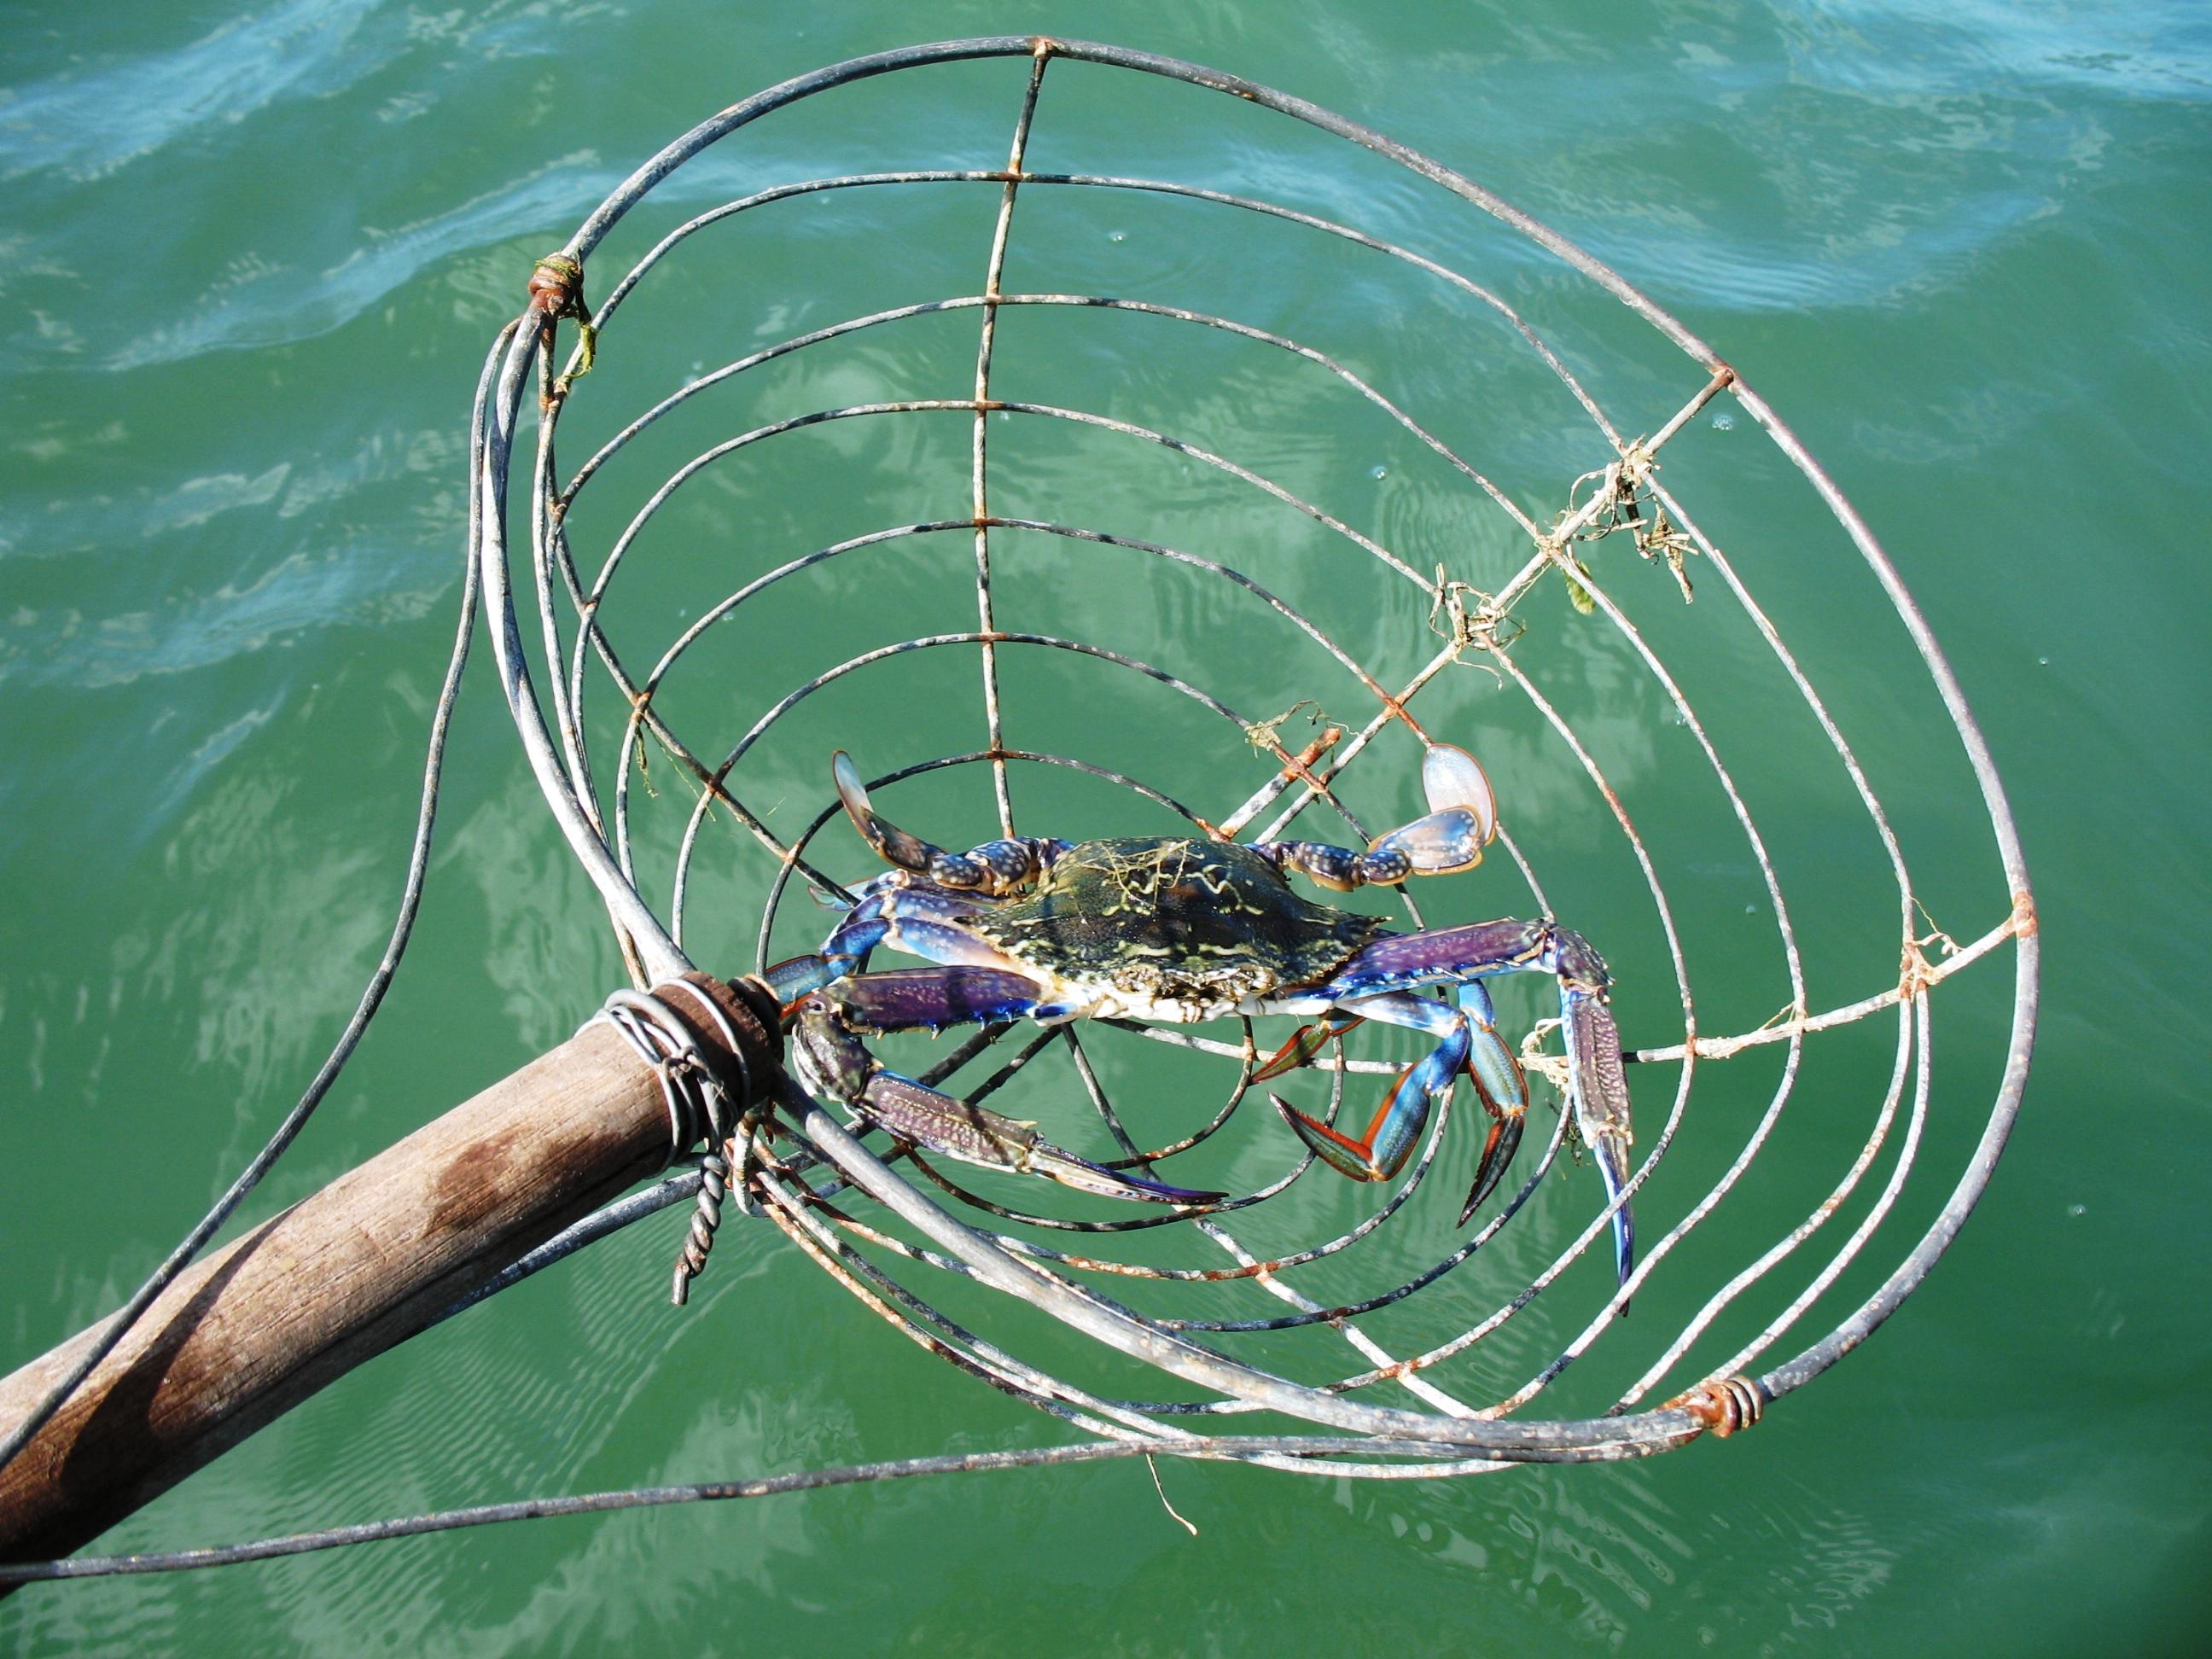 Scooping crabs